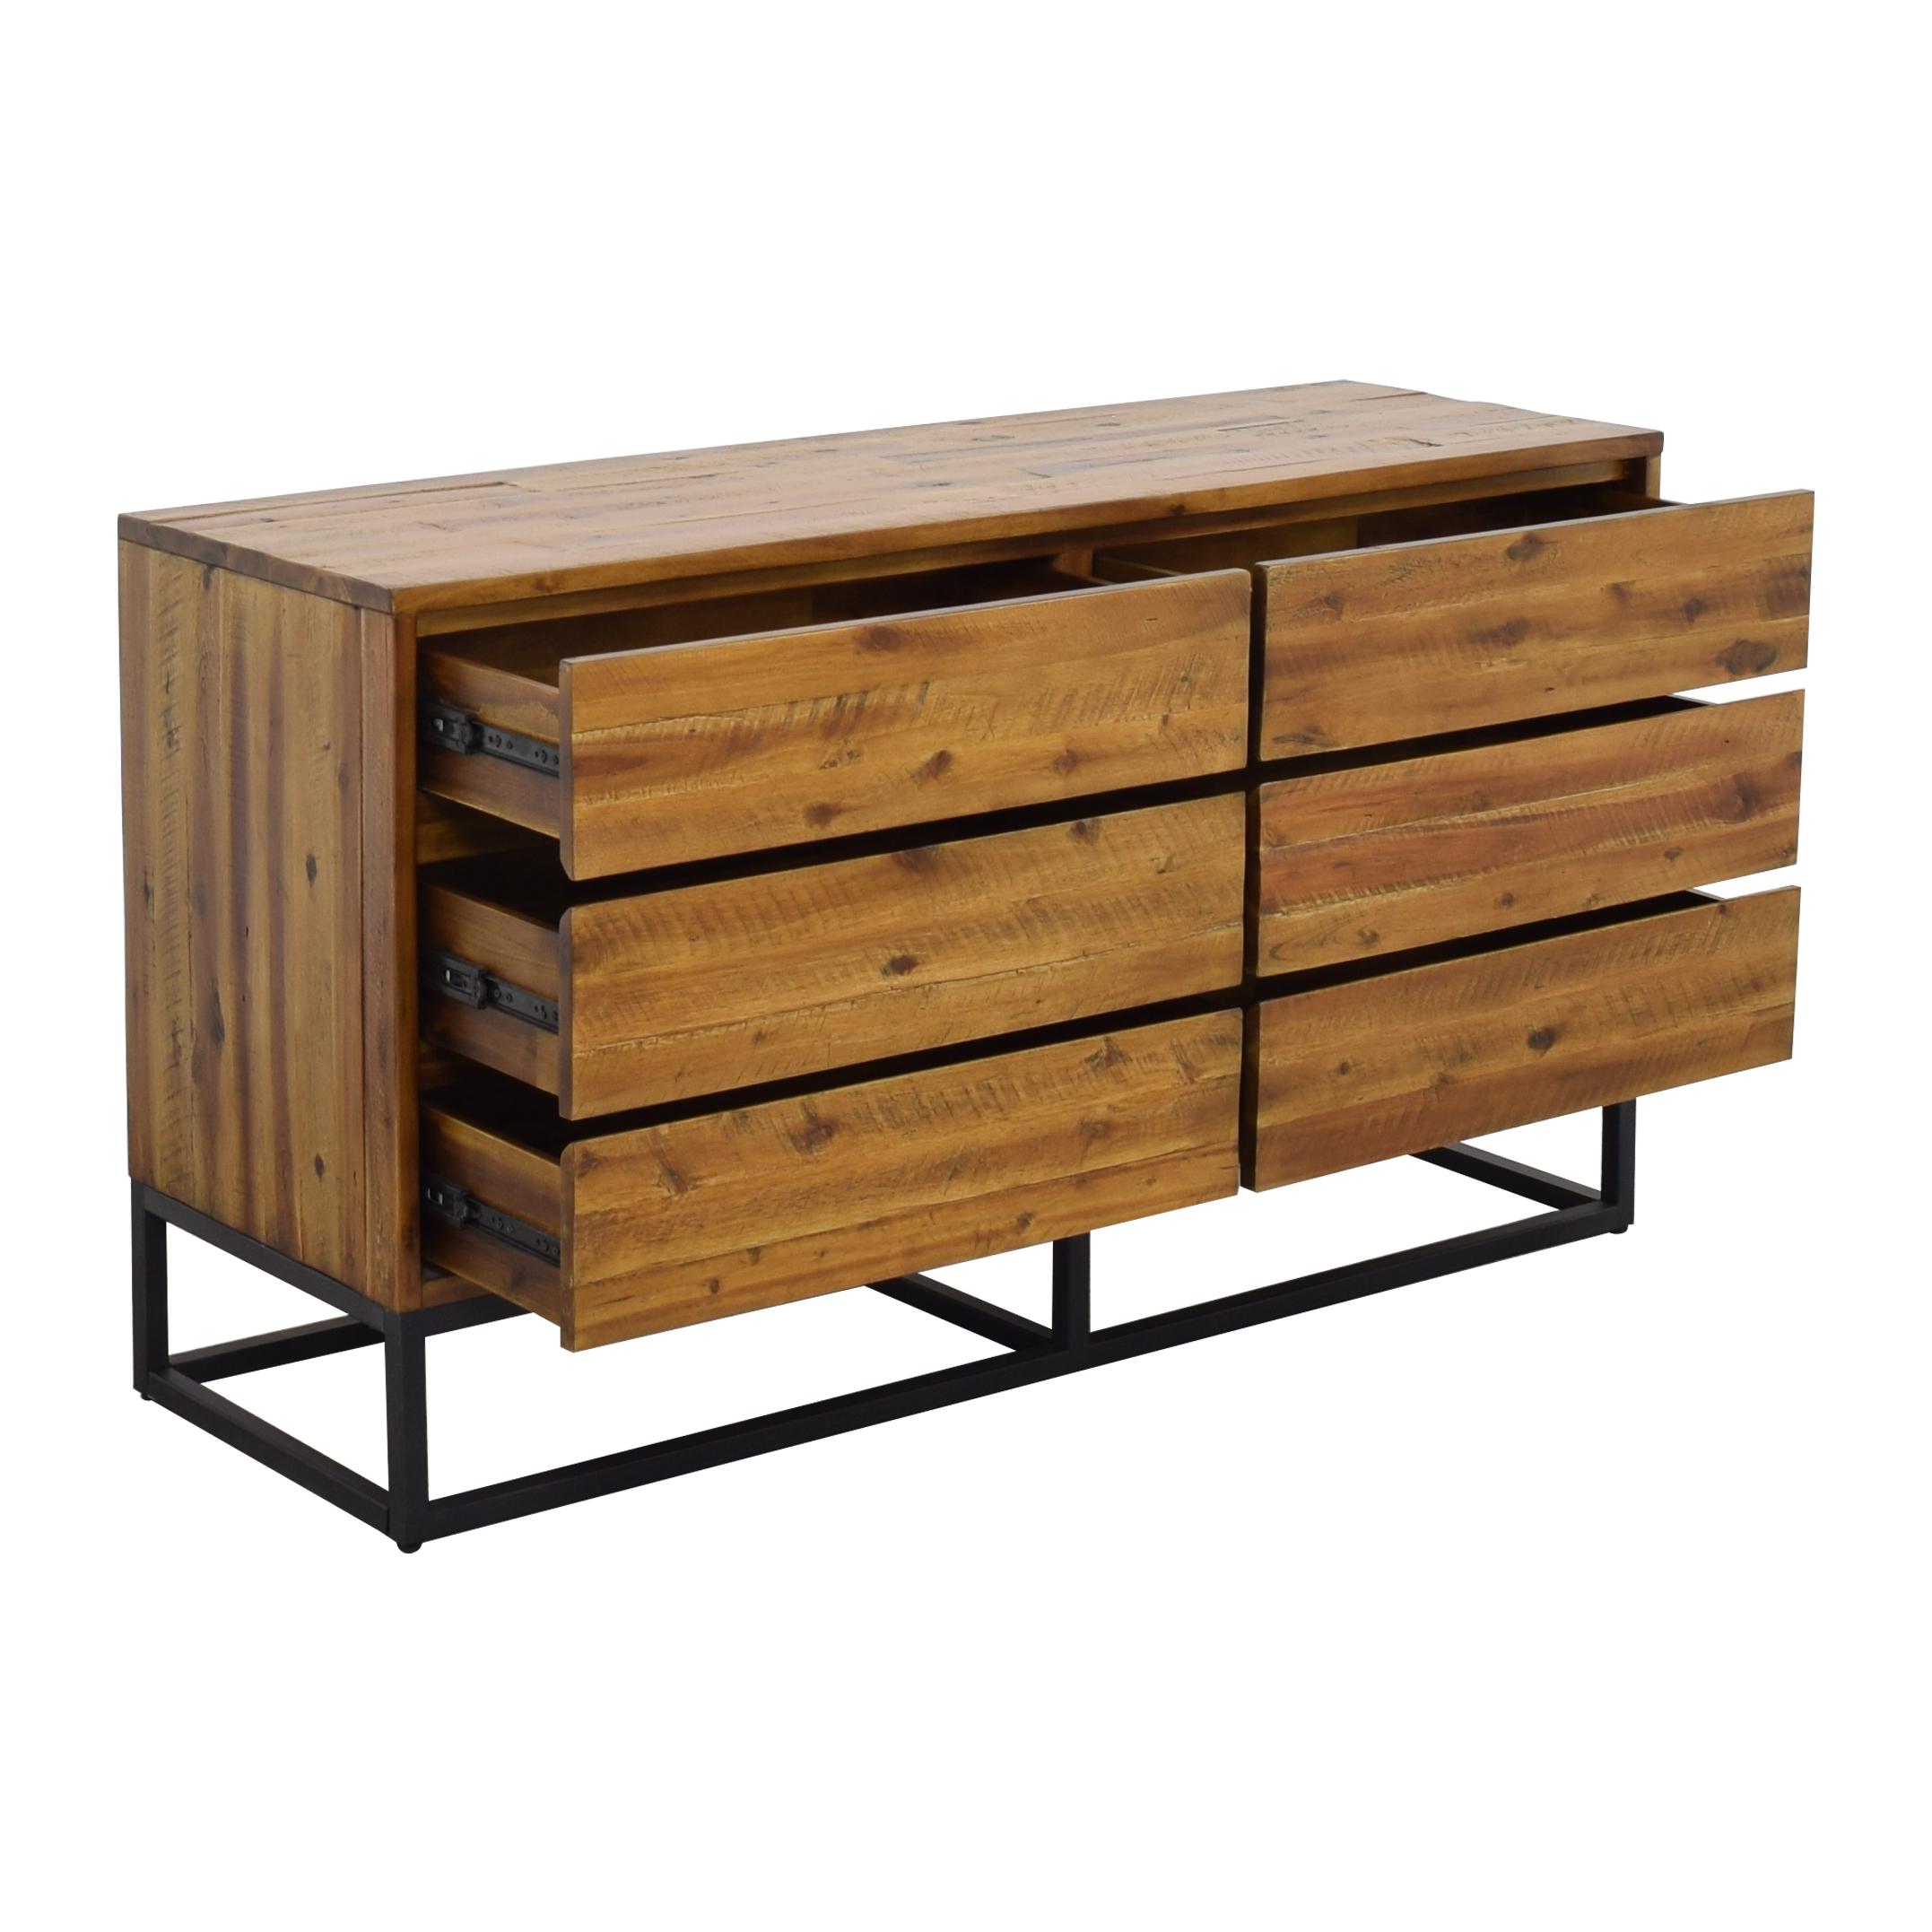 West Elm West Elm Logan Industrial 6-Drawer Dresser used